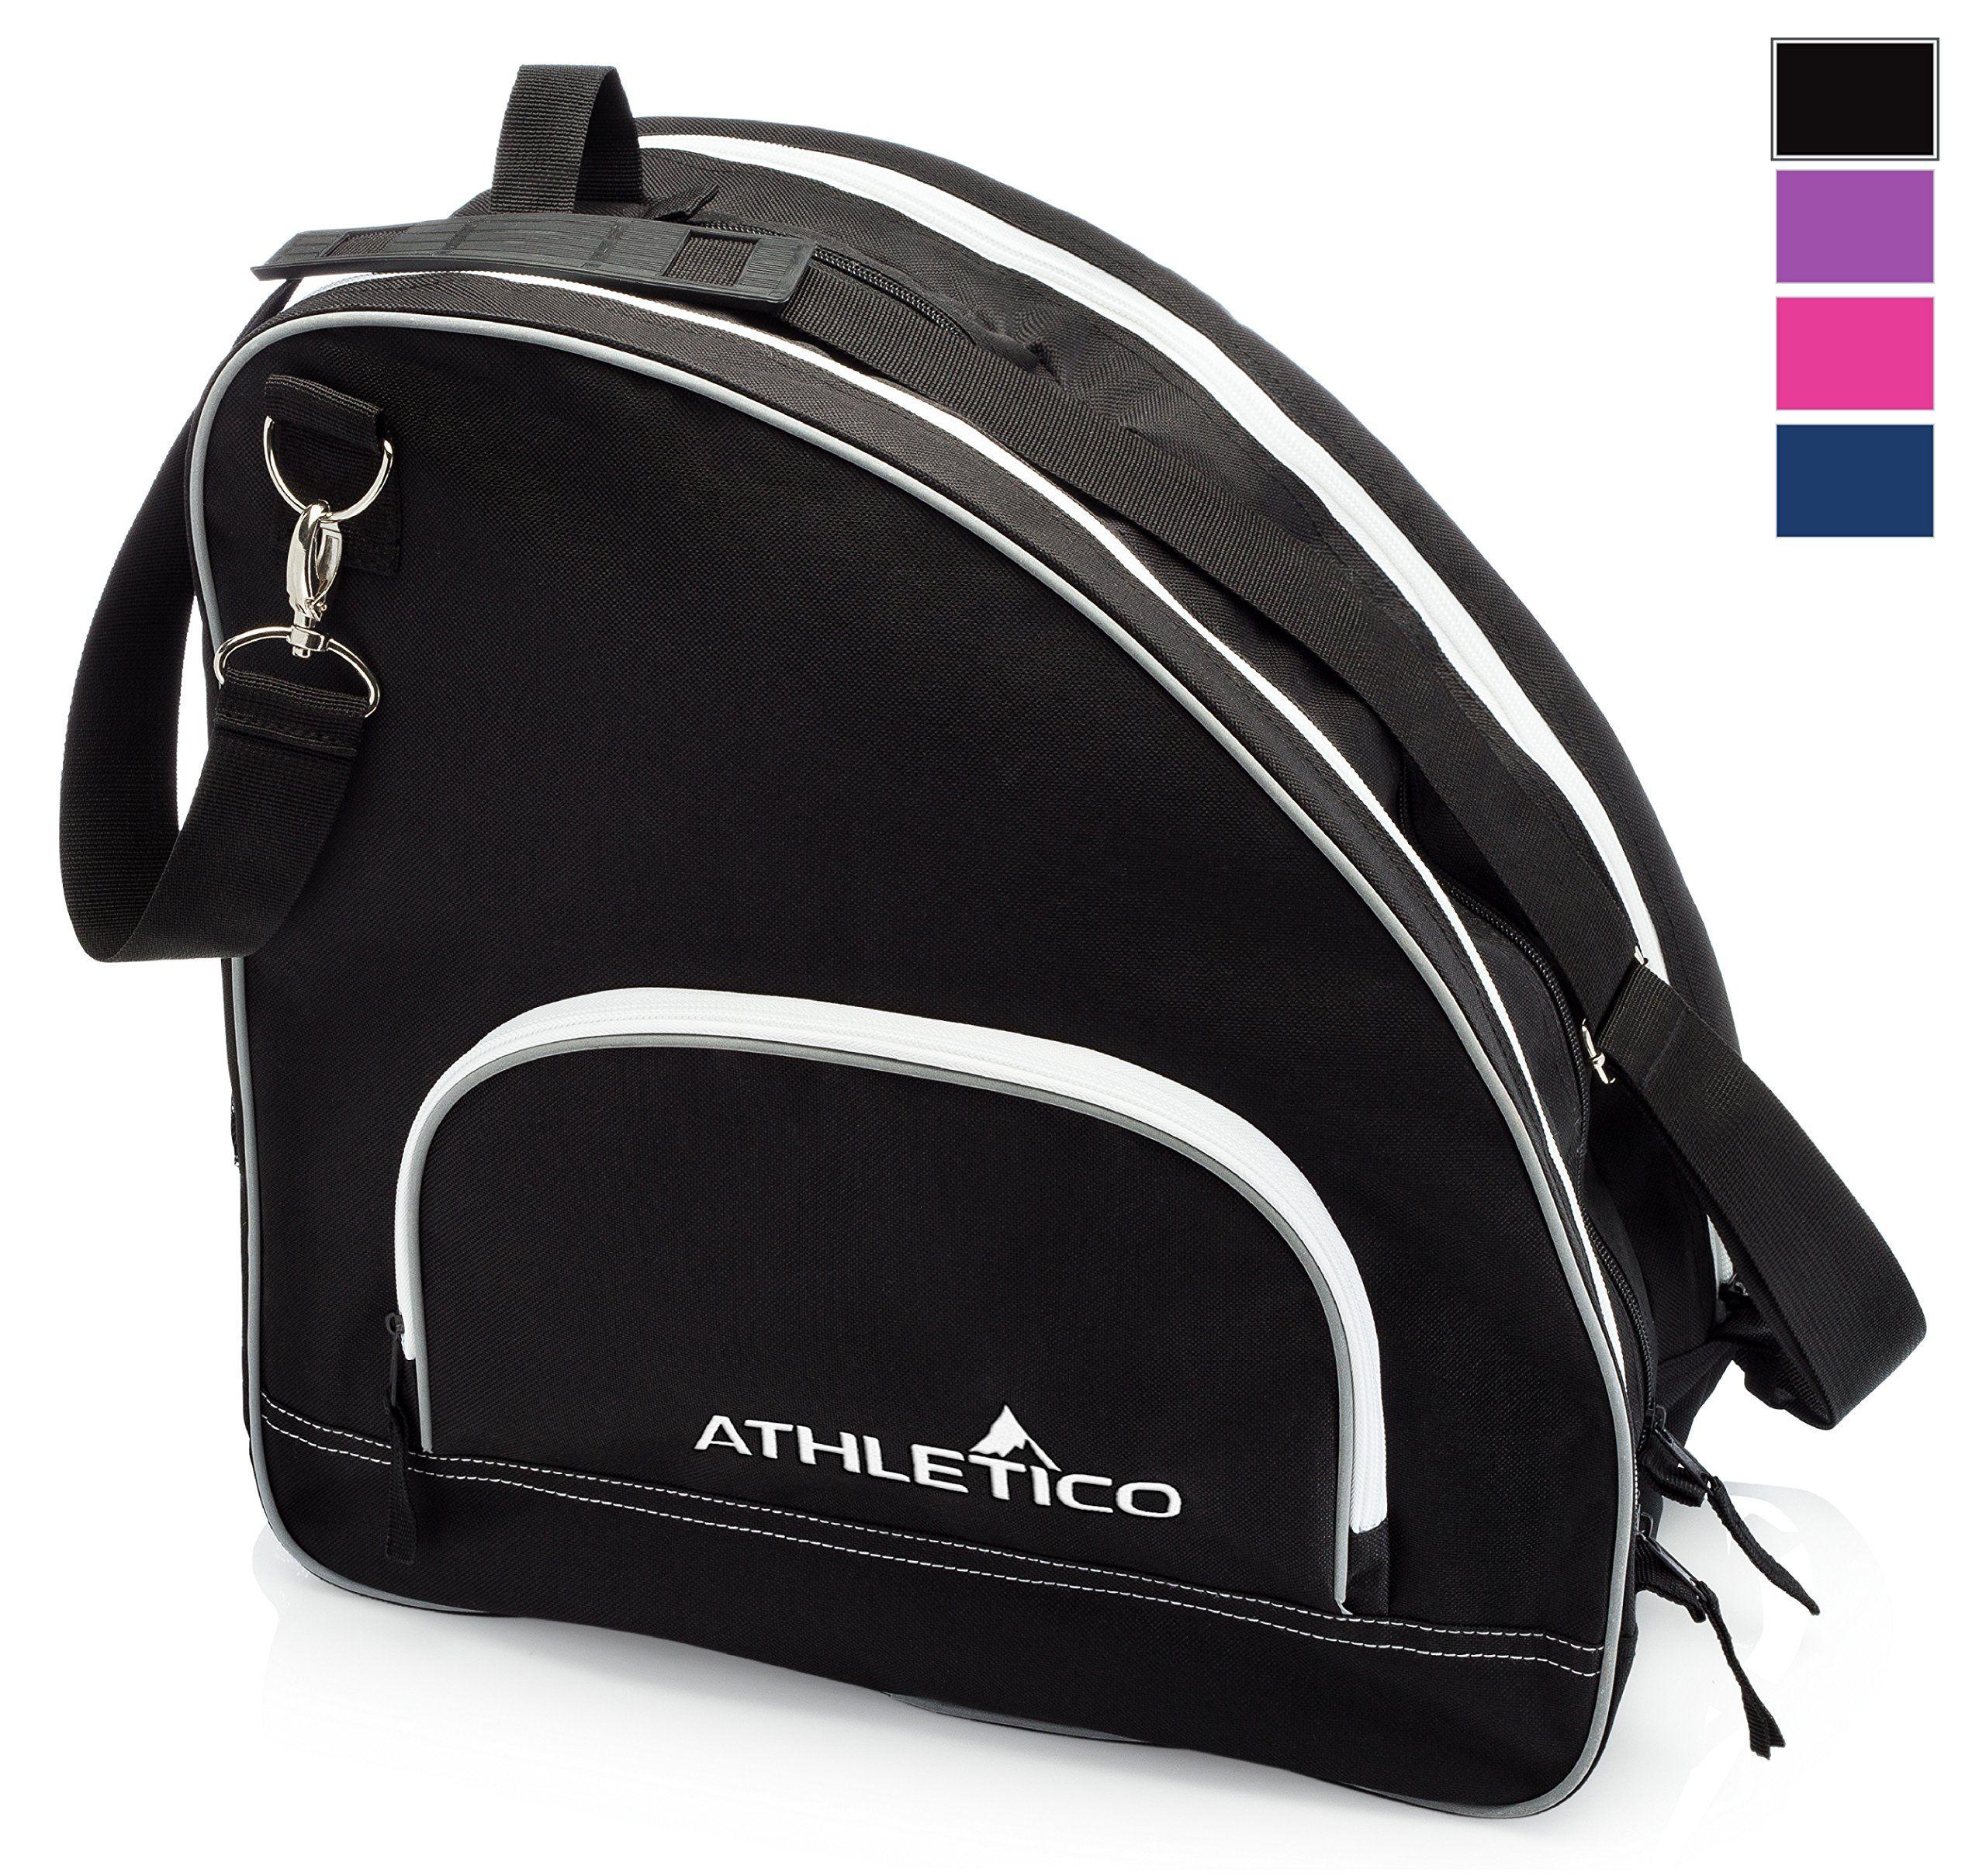 Athletico Ice Inline Skate Bag Premium Bag To Carry Ice Skates Roller Skates Inline Skates For Inline Skate Inline Skating Ice Skating